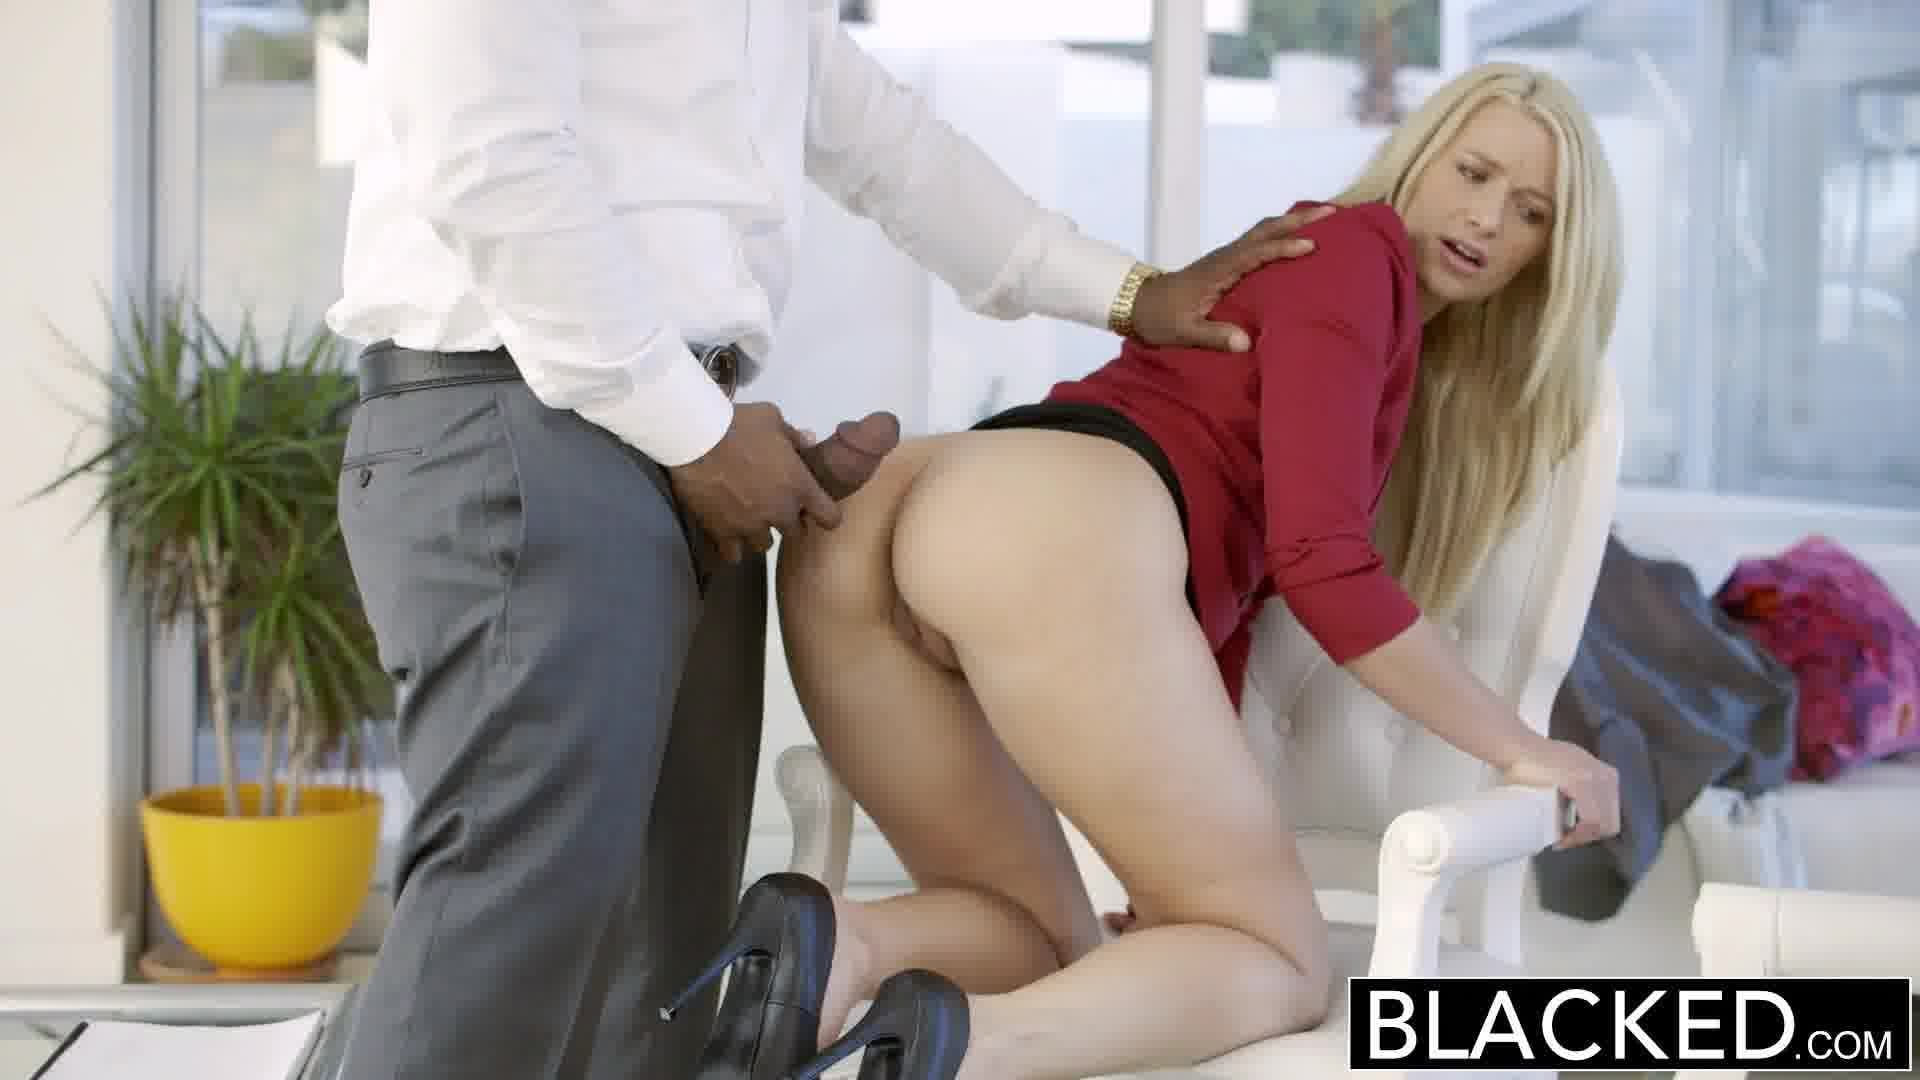 La Bacheliere Doggy Porn Gif